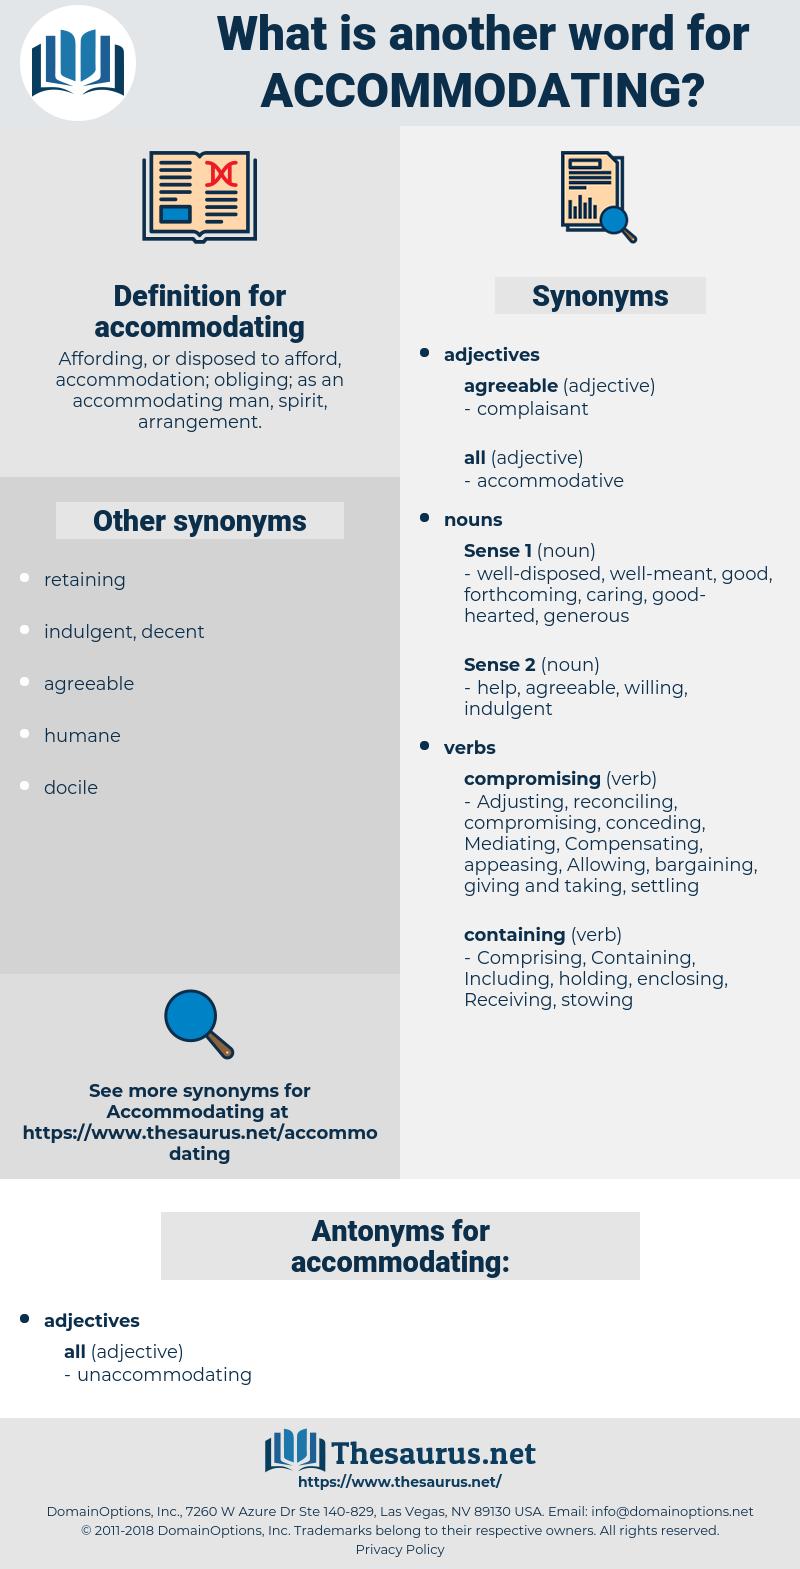 accommodating, synonym accommodating, another word for accommodating, words like accommodating, thesaurus accommodating